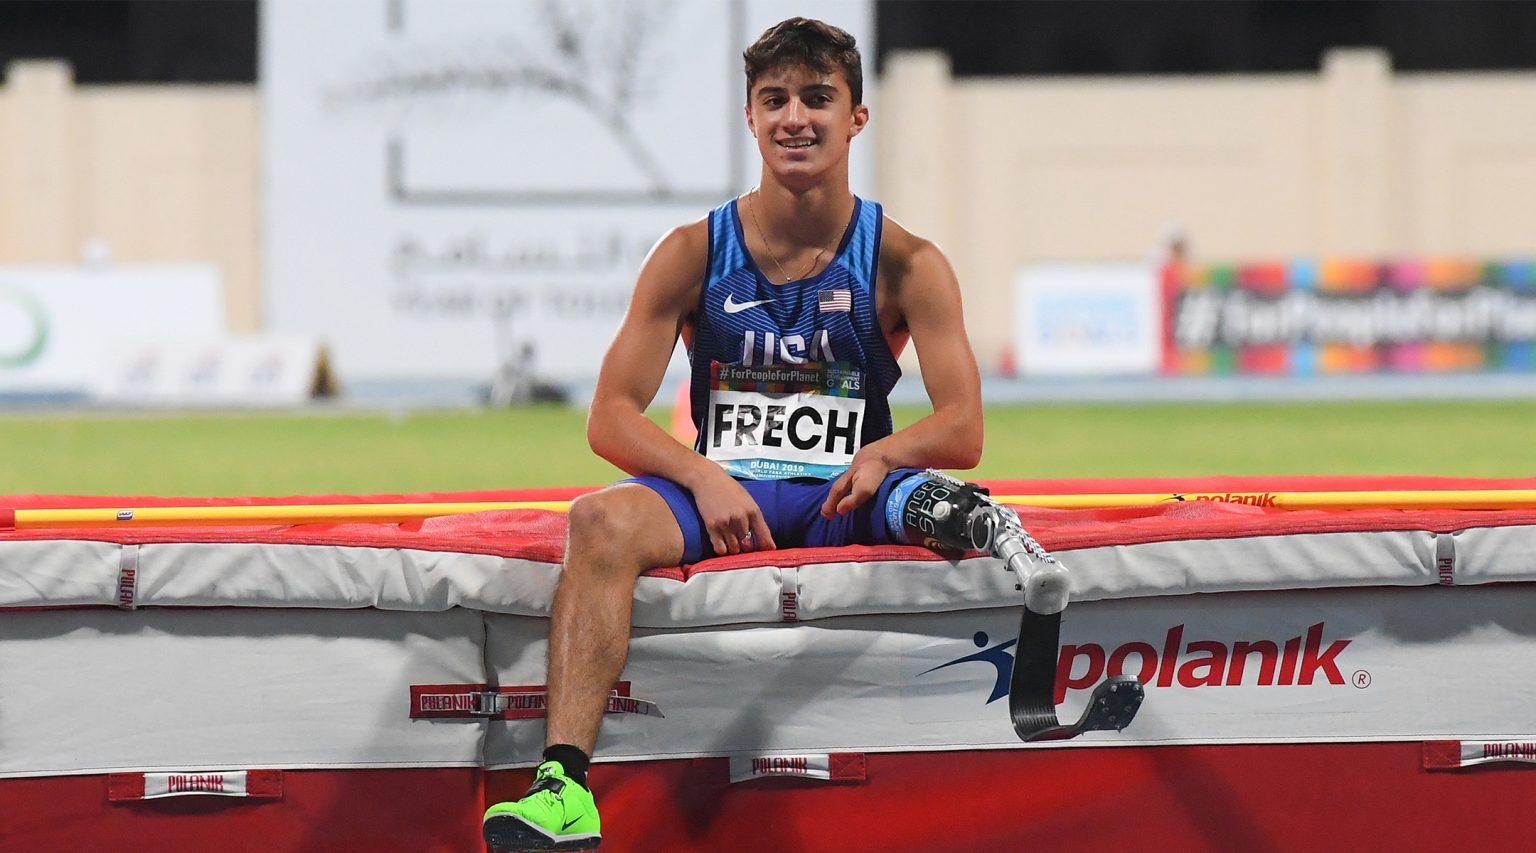 Ezra Frech competes in the men's high jump T63 final at the World Para Athletics Championships, Nov. 11, 2019. (Photo/JTA-Moto Yoshimura-Getty Images)